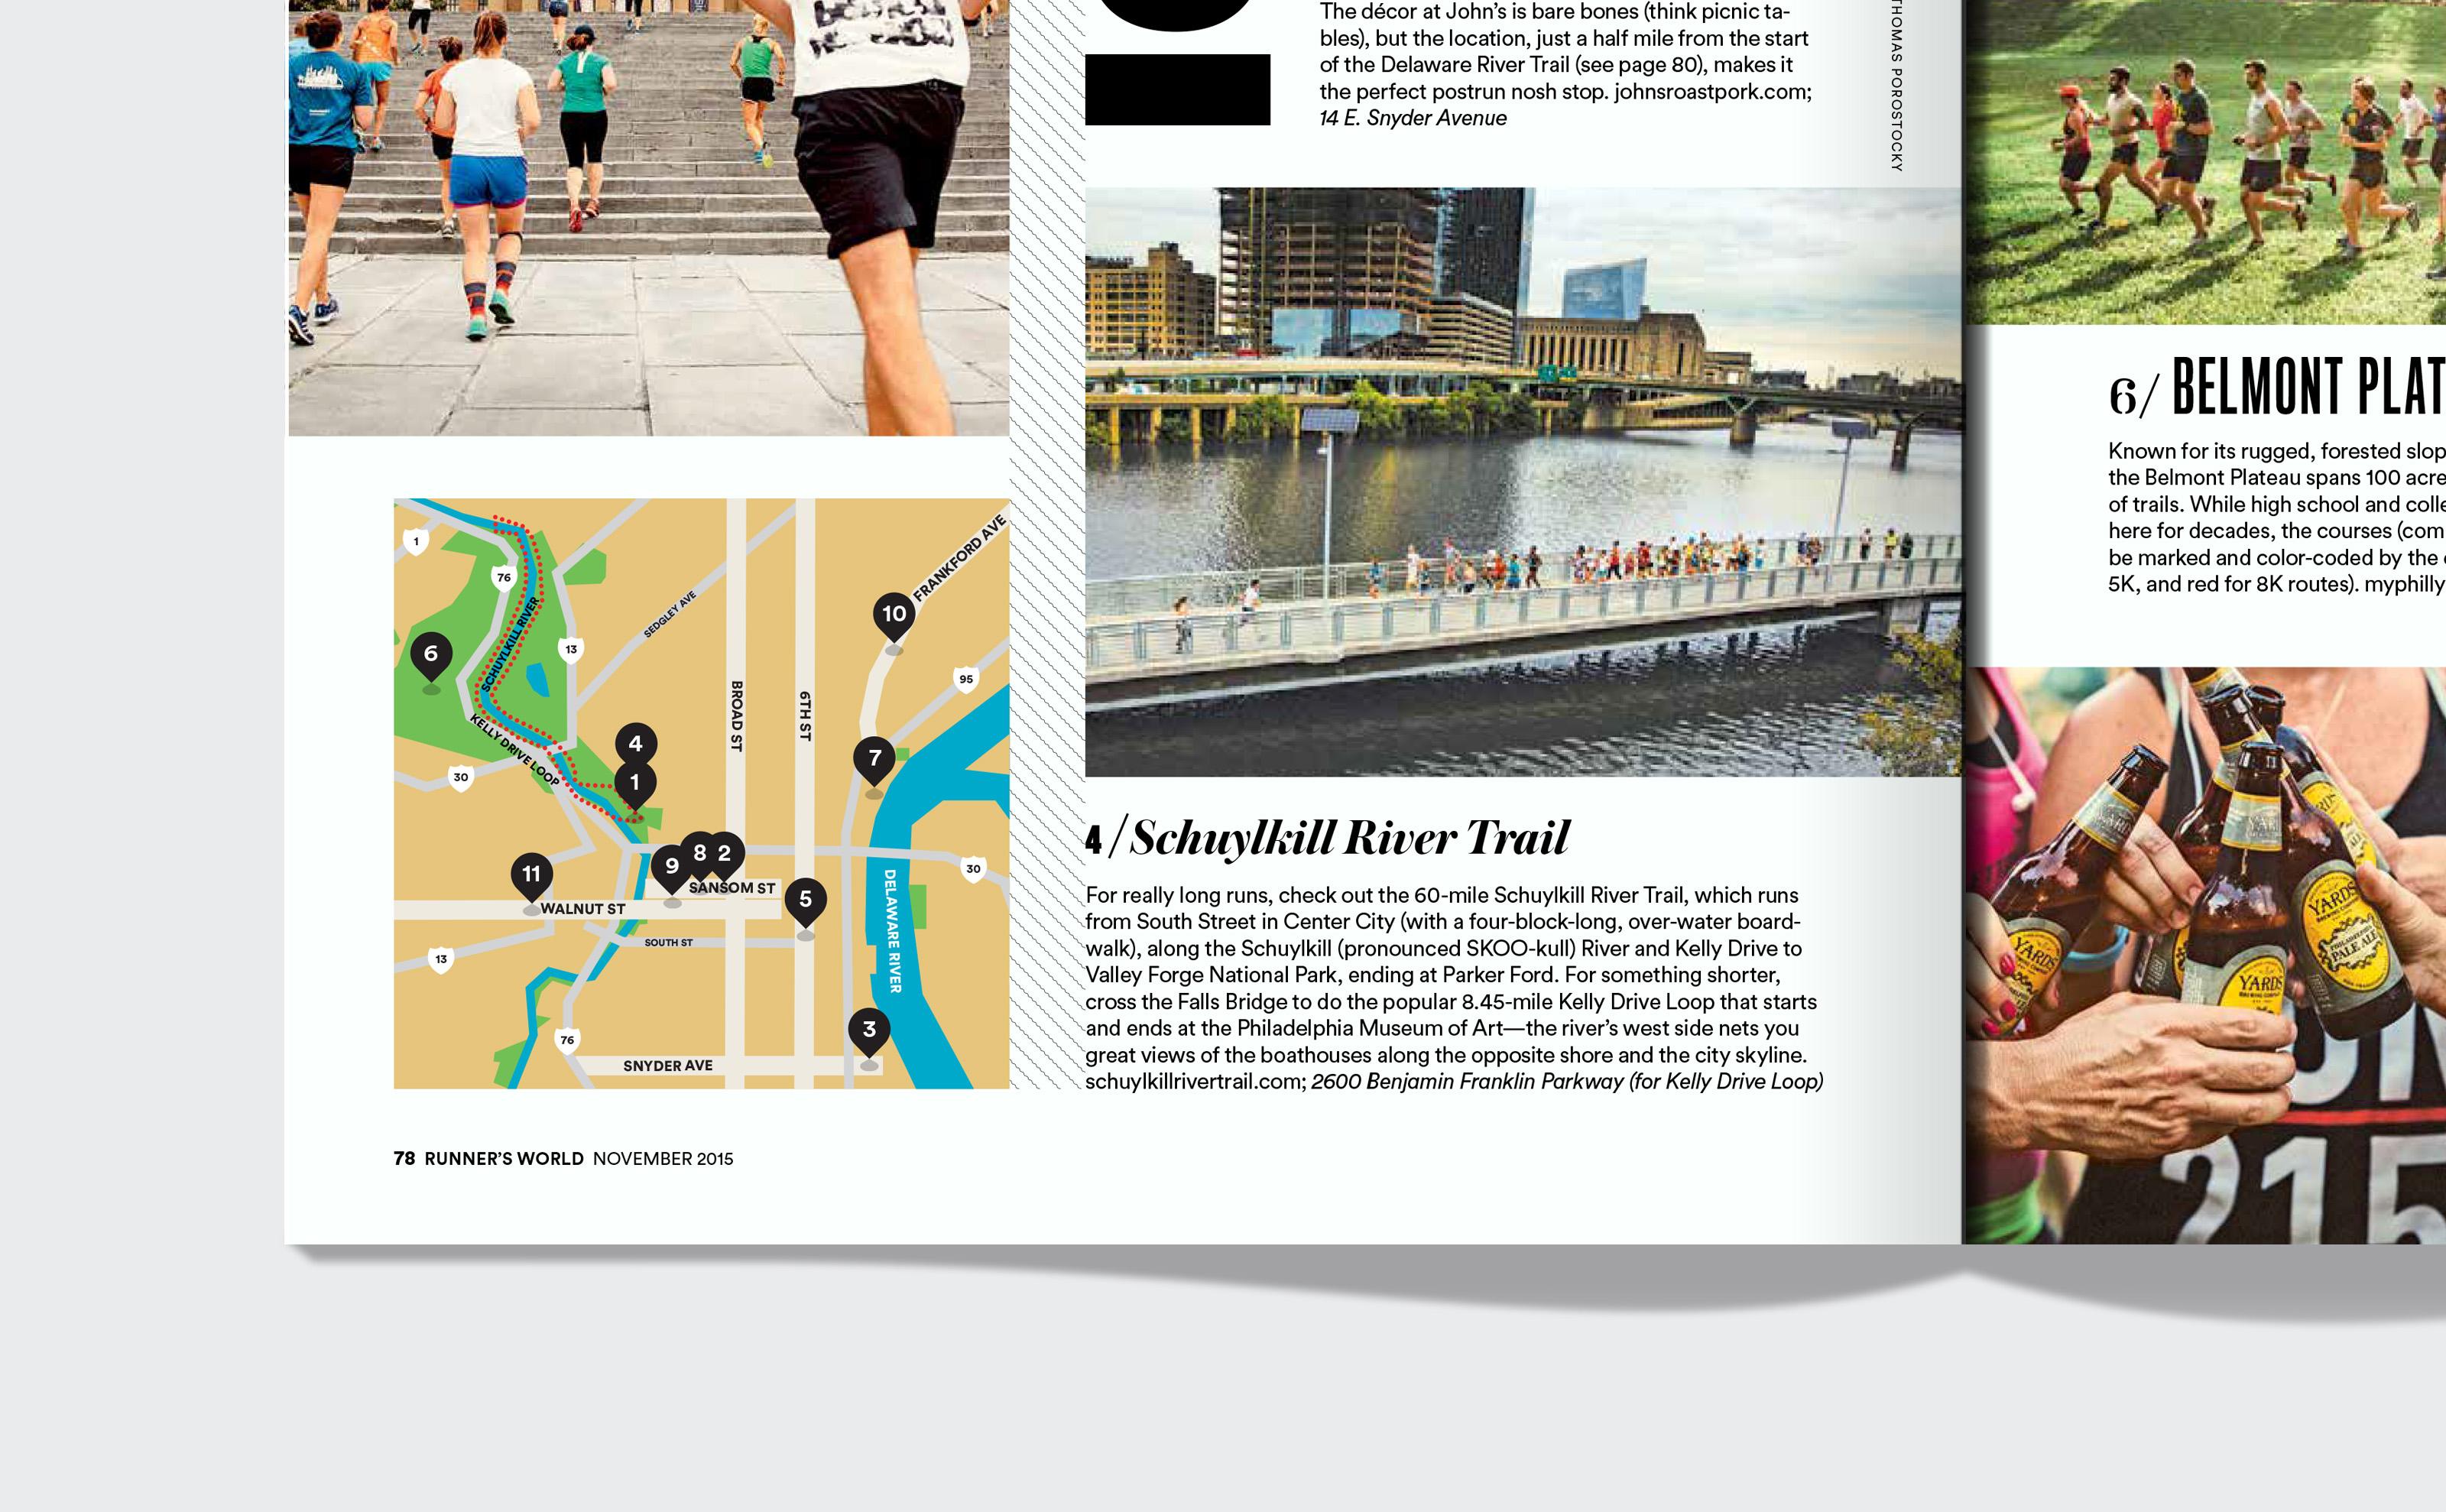 Runners World map of Philadelphia detail schuykill river tail